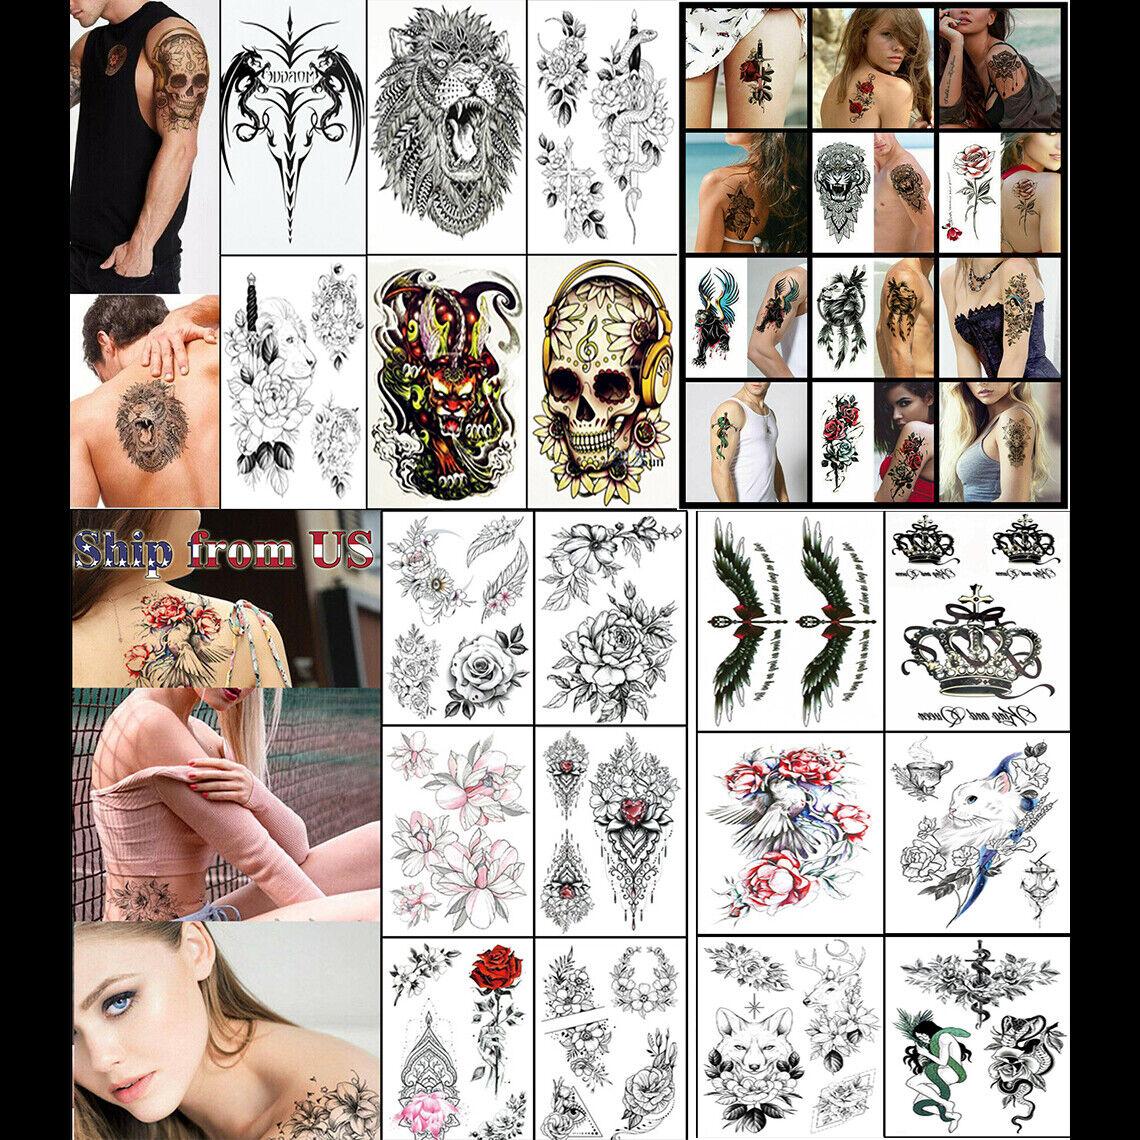 Temporary Tattoo Stickers Waterproof Arm Leg Body Art Fake Colorful Tattoos US Health & Beauty